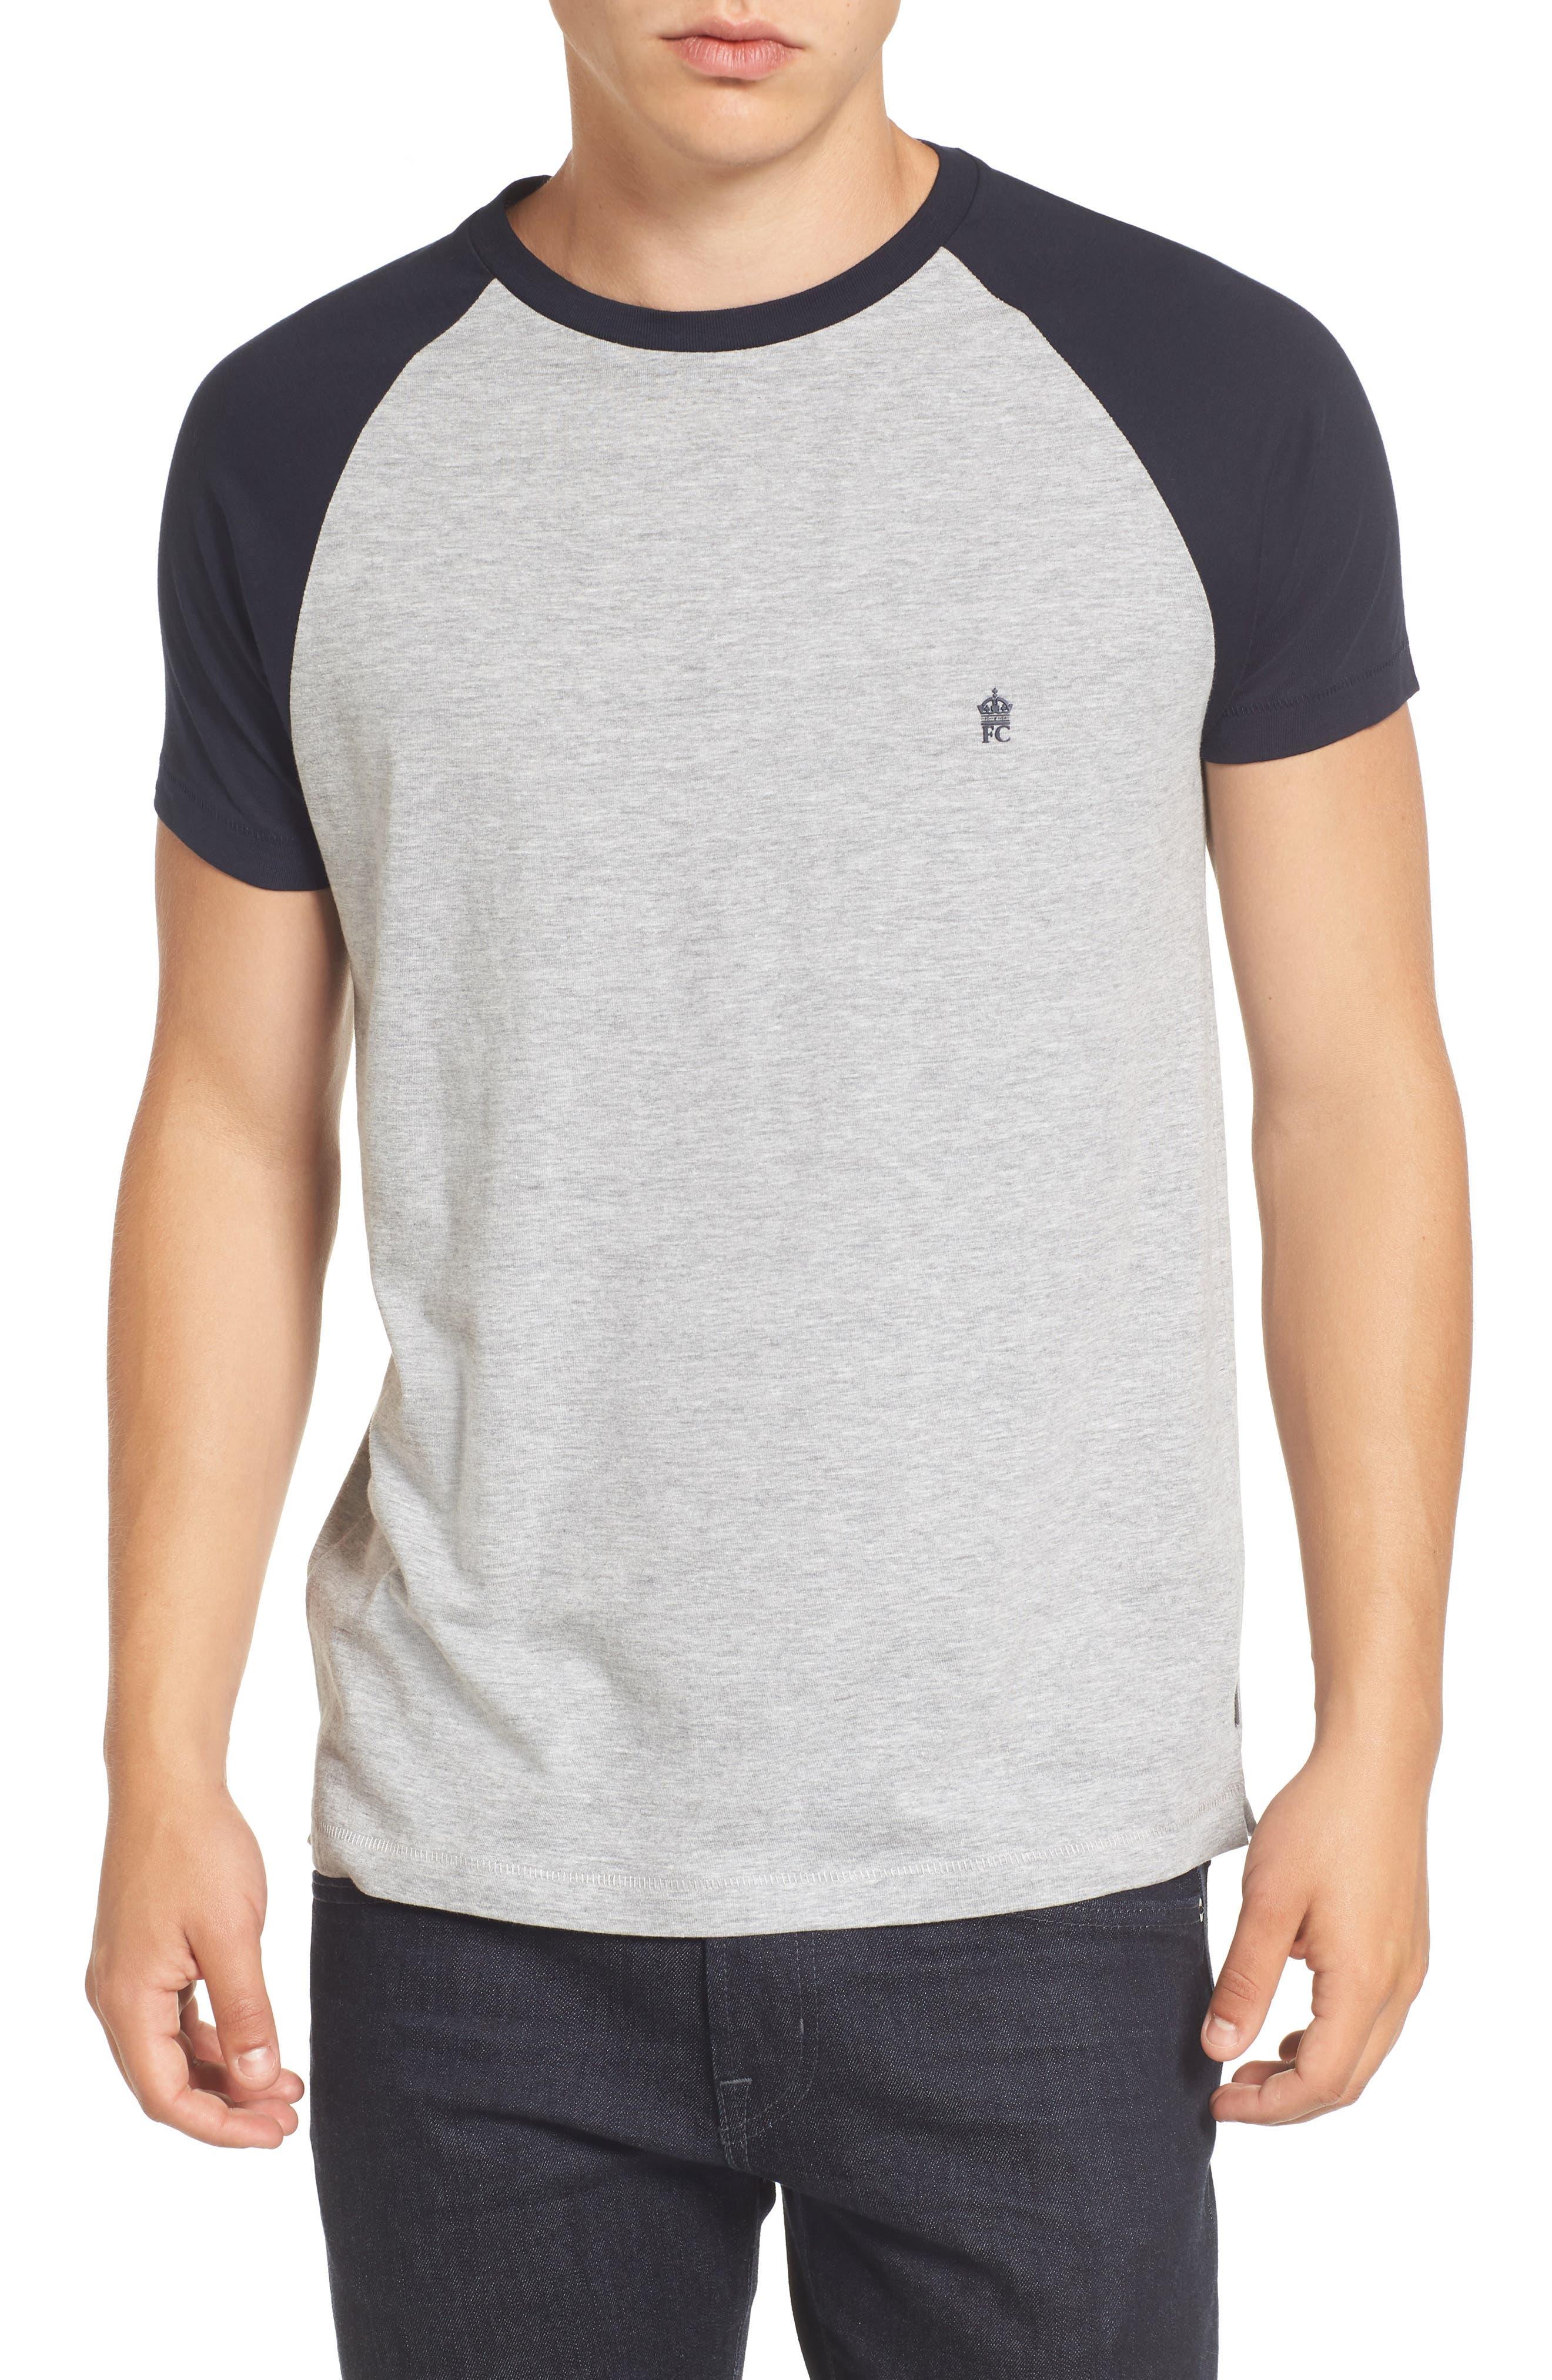 Main Image - French Connection Raglan Short Sleeve T-Shirt